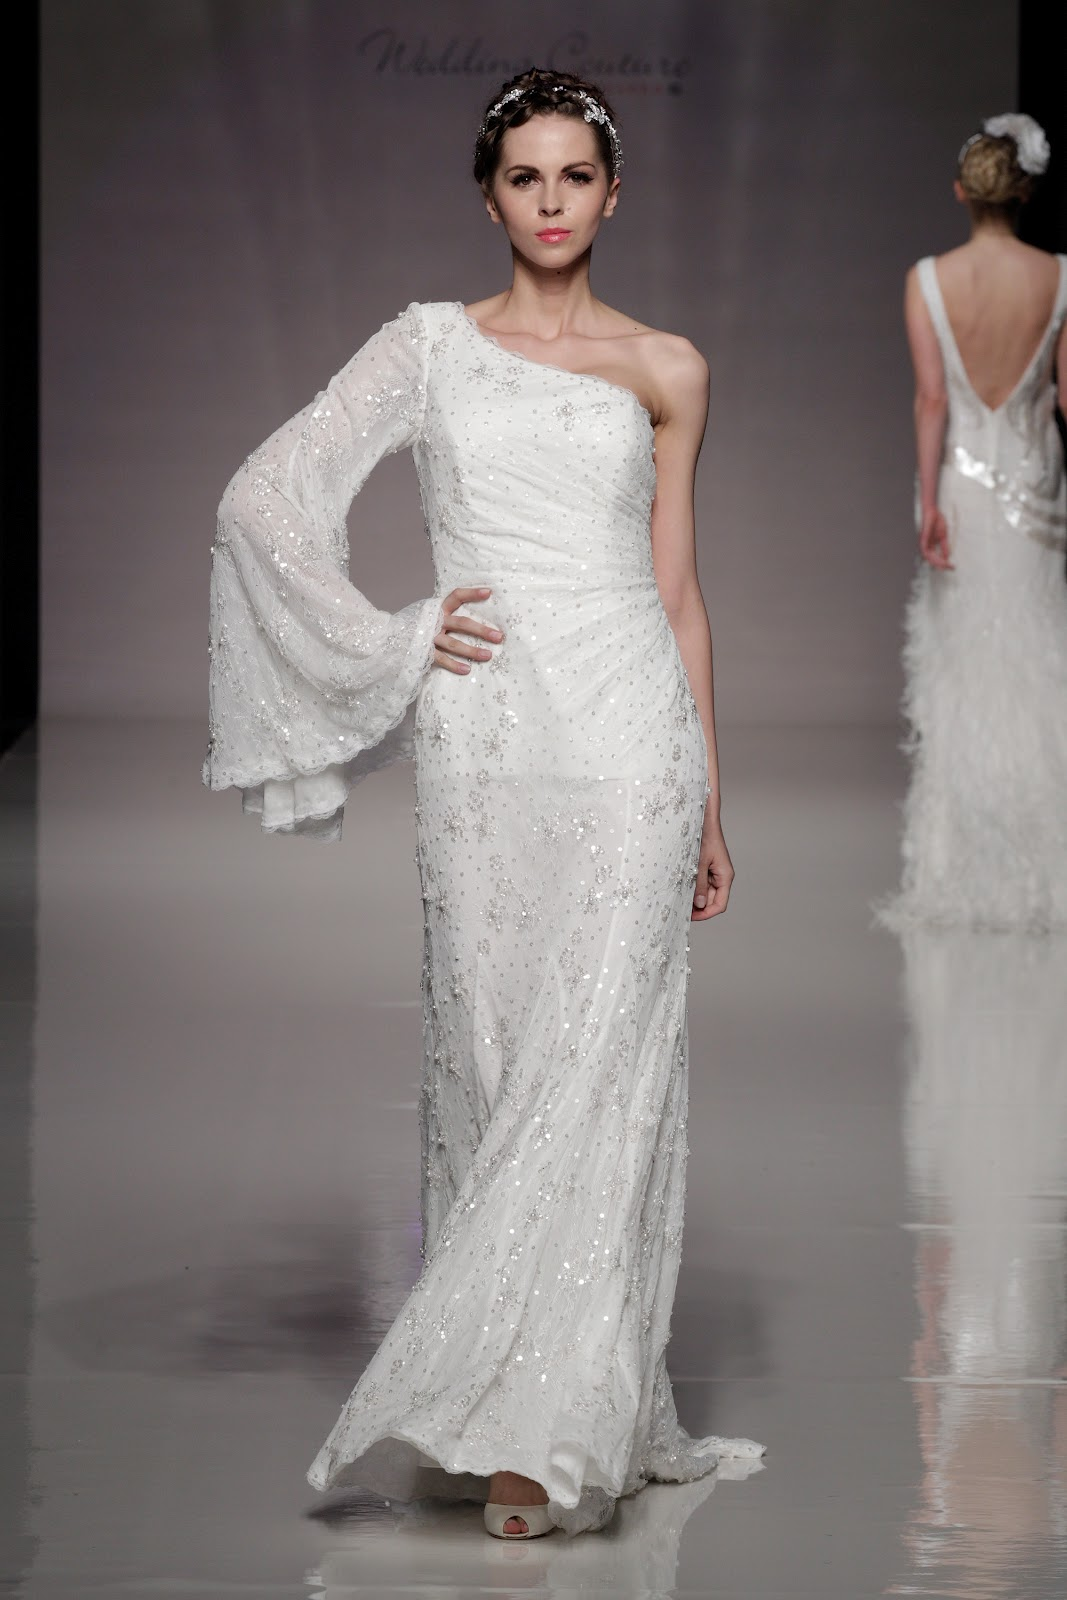 frumpy to funky Bridal Fashion 2013 Anoushka G's Around